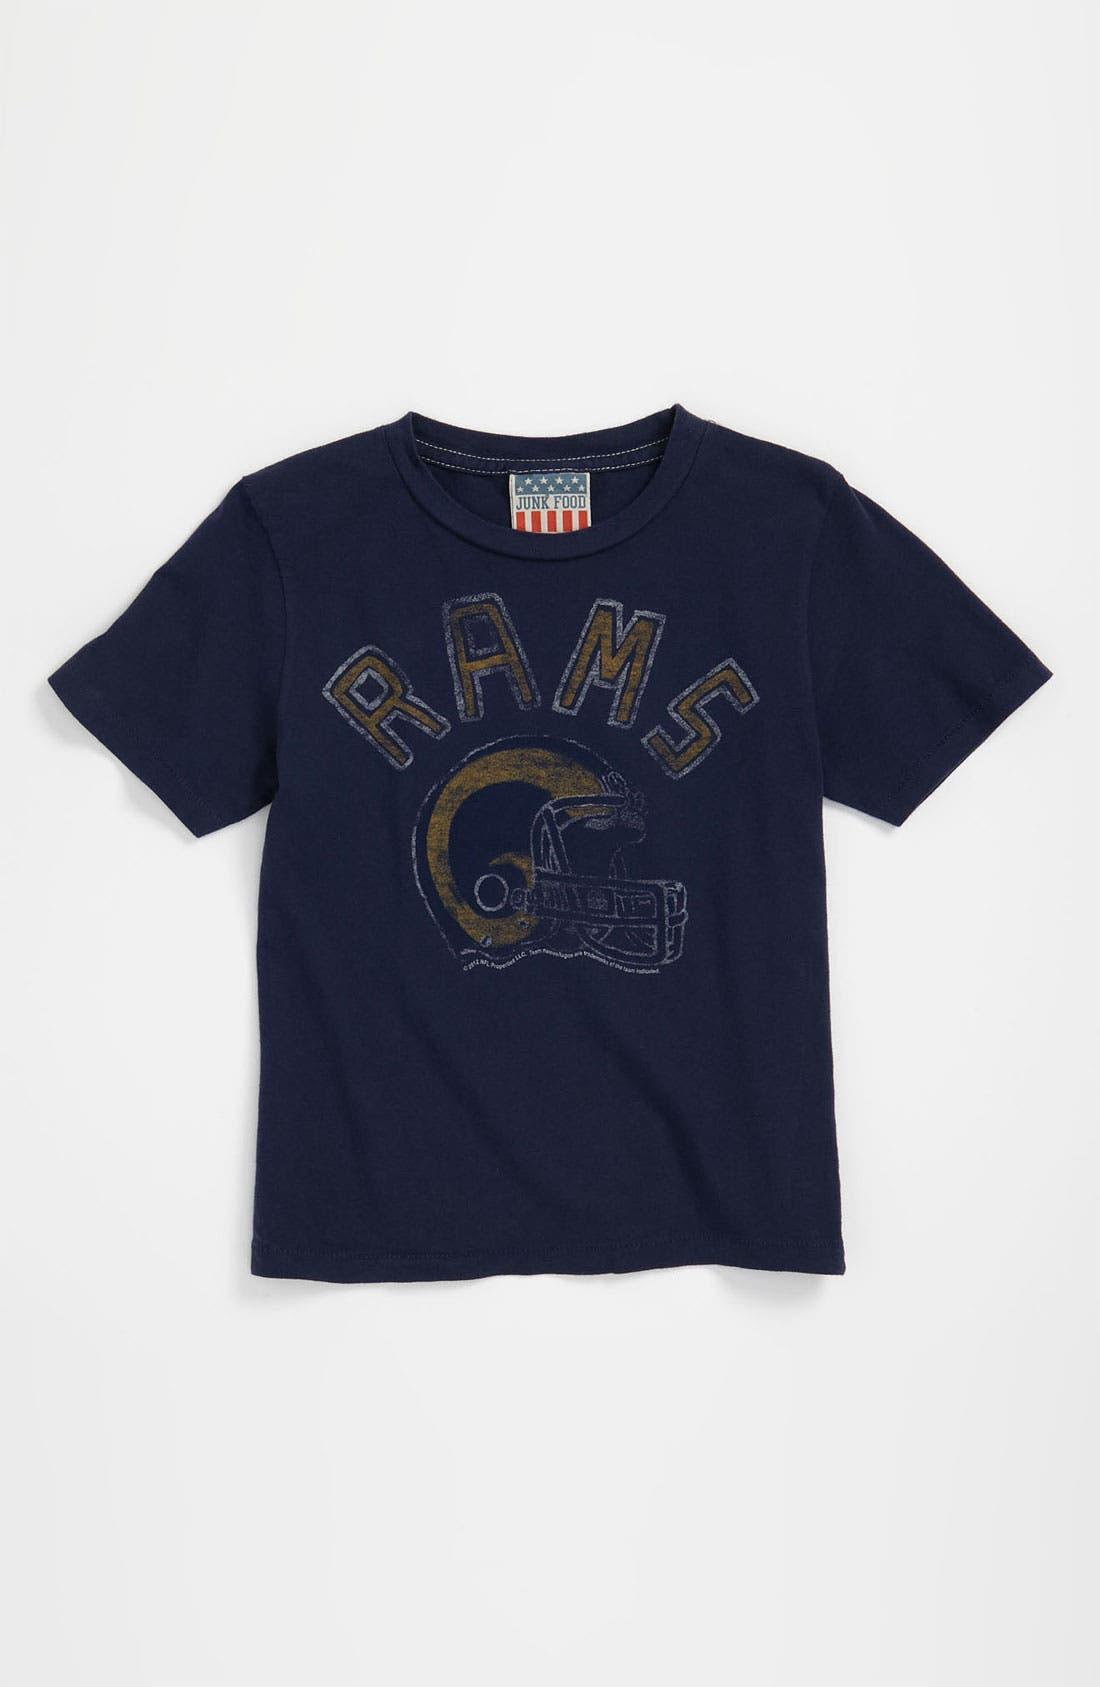 Main Image - Junk Food 'St. Louis Rams' T-Shirt (Toddler)